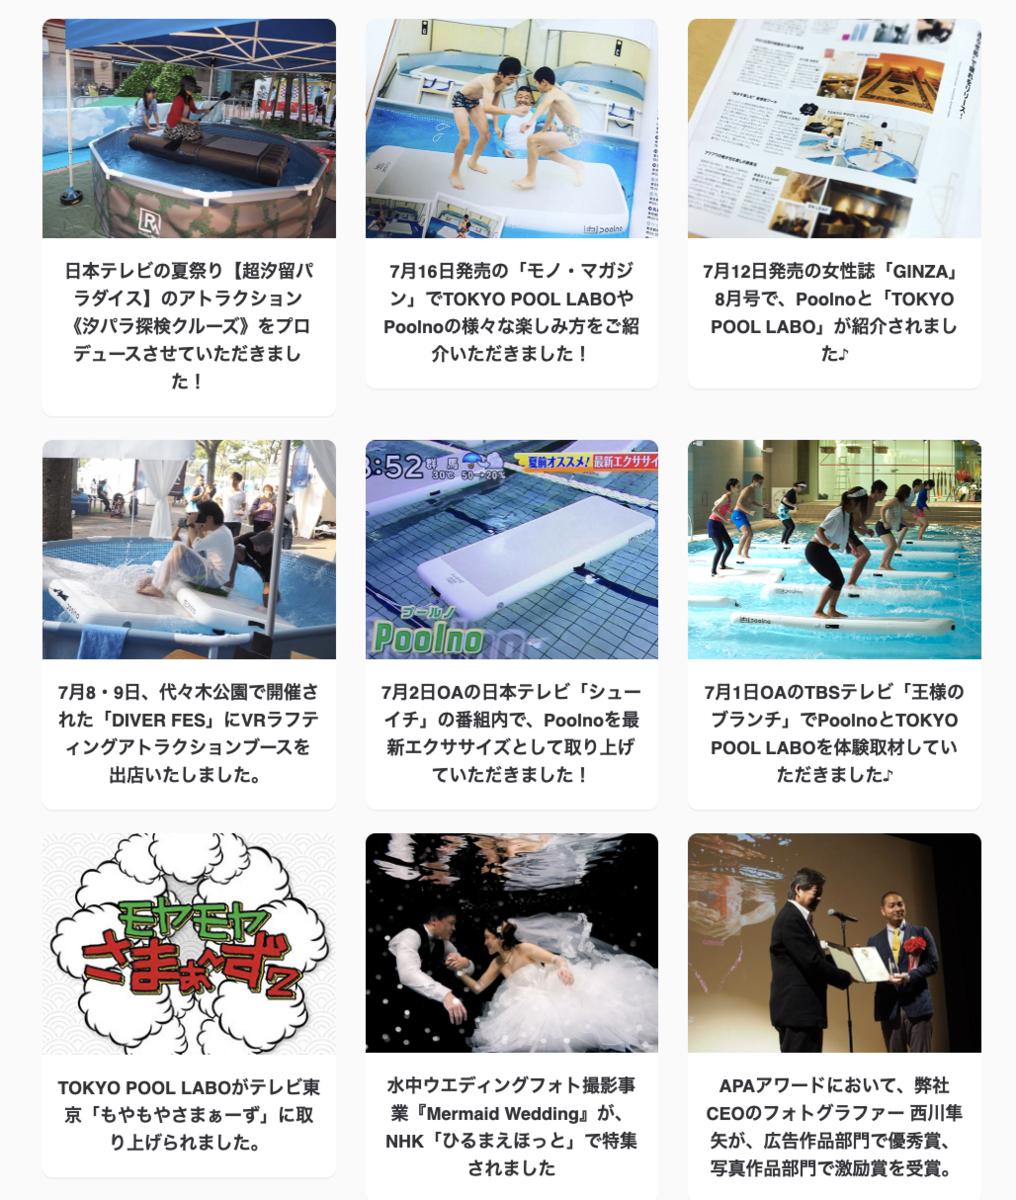 f:id:yukichi-liberal:20191028135902p:plain